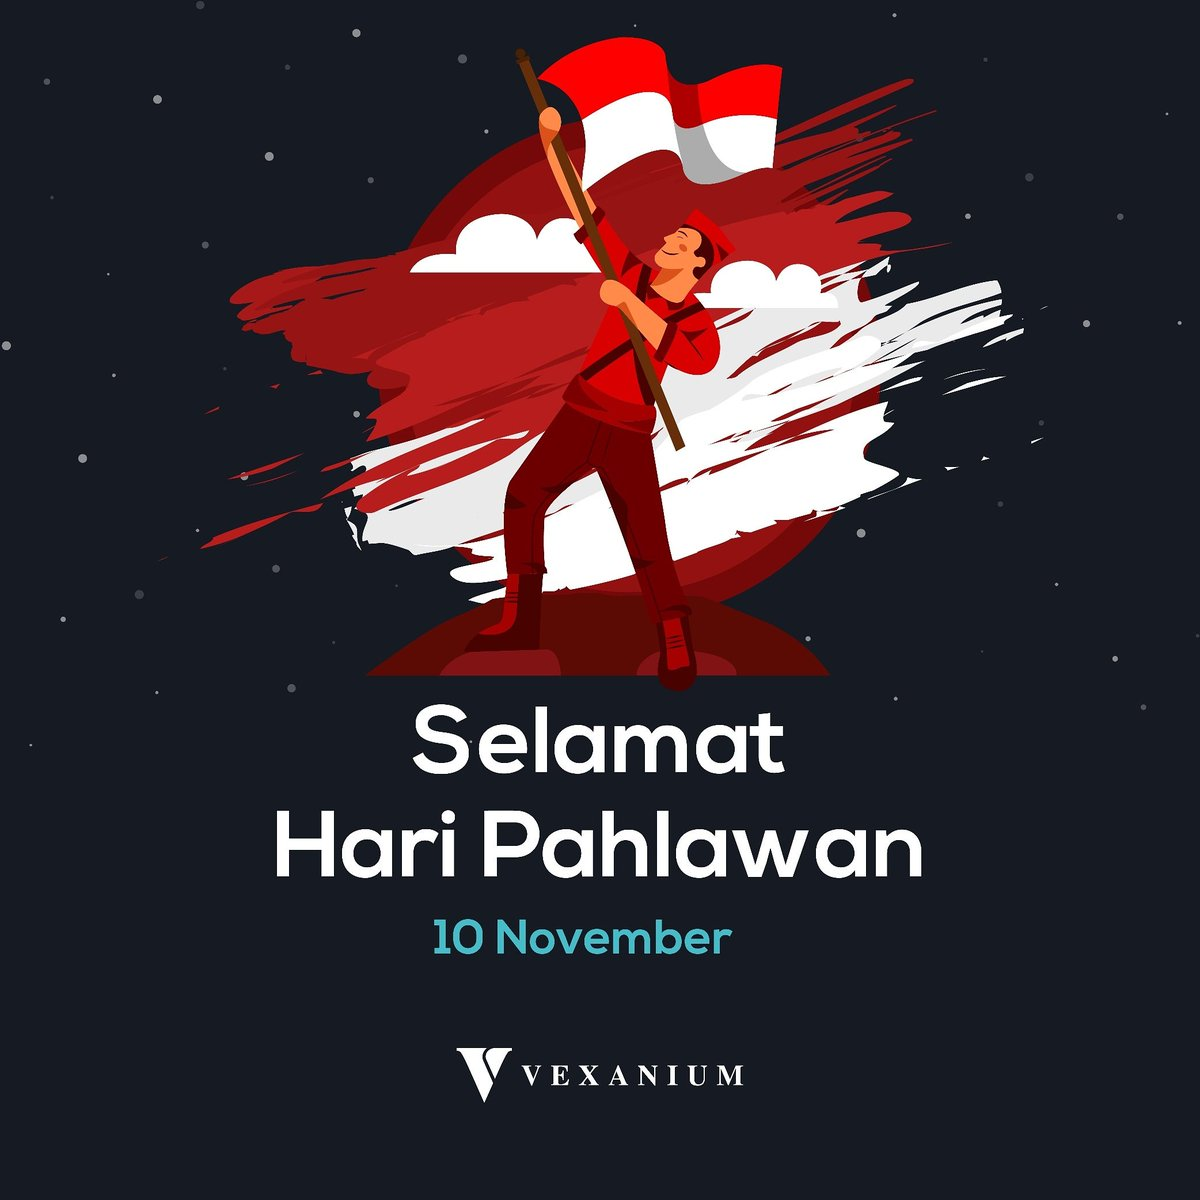 Peninggalan dari pahlawan adalah kenangan akan nama yang hebat dan warisan akan teladan yang hebat.  Selamat Hari Pahlawan, Vex Partners!  #haripahlawan #nasional #indonesia #vexanium #blockchain #pahlawan #merahputih